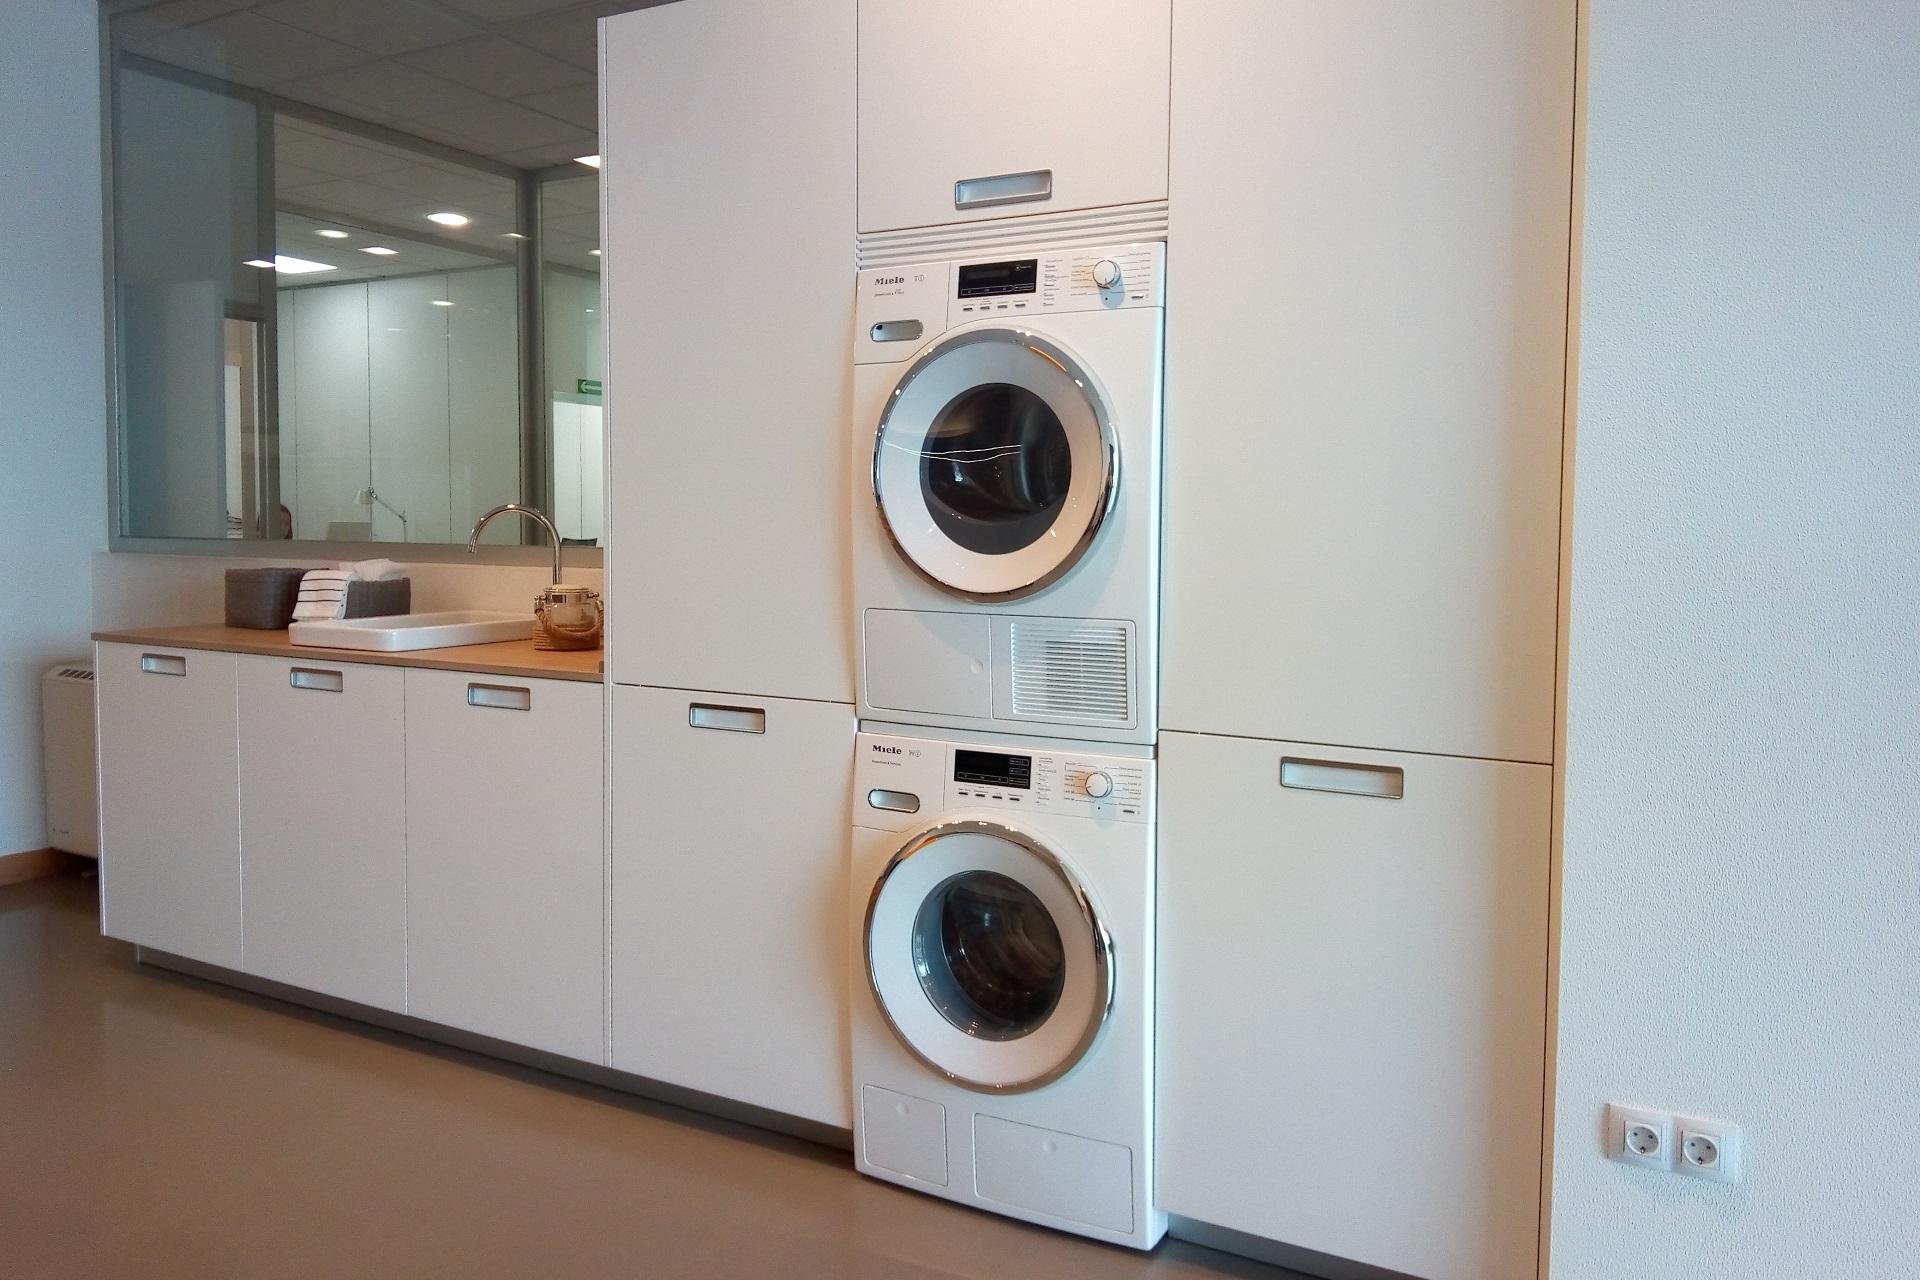 Image lavanderia-outlet-santiago-interiores-1